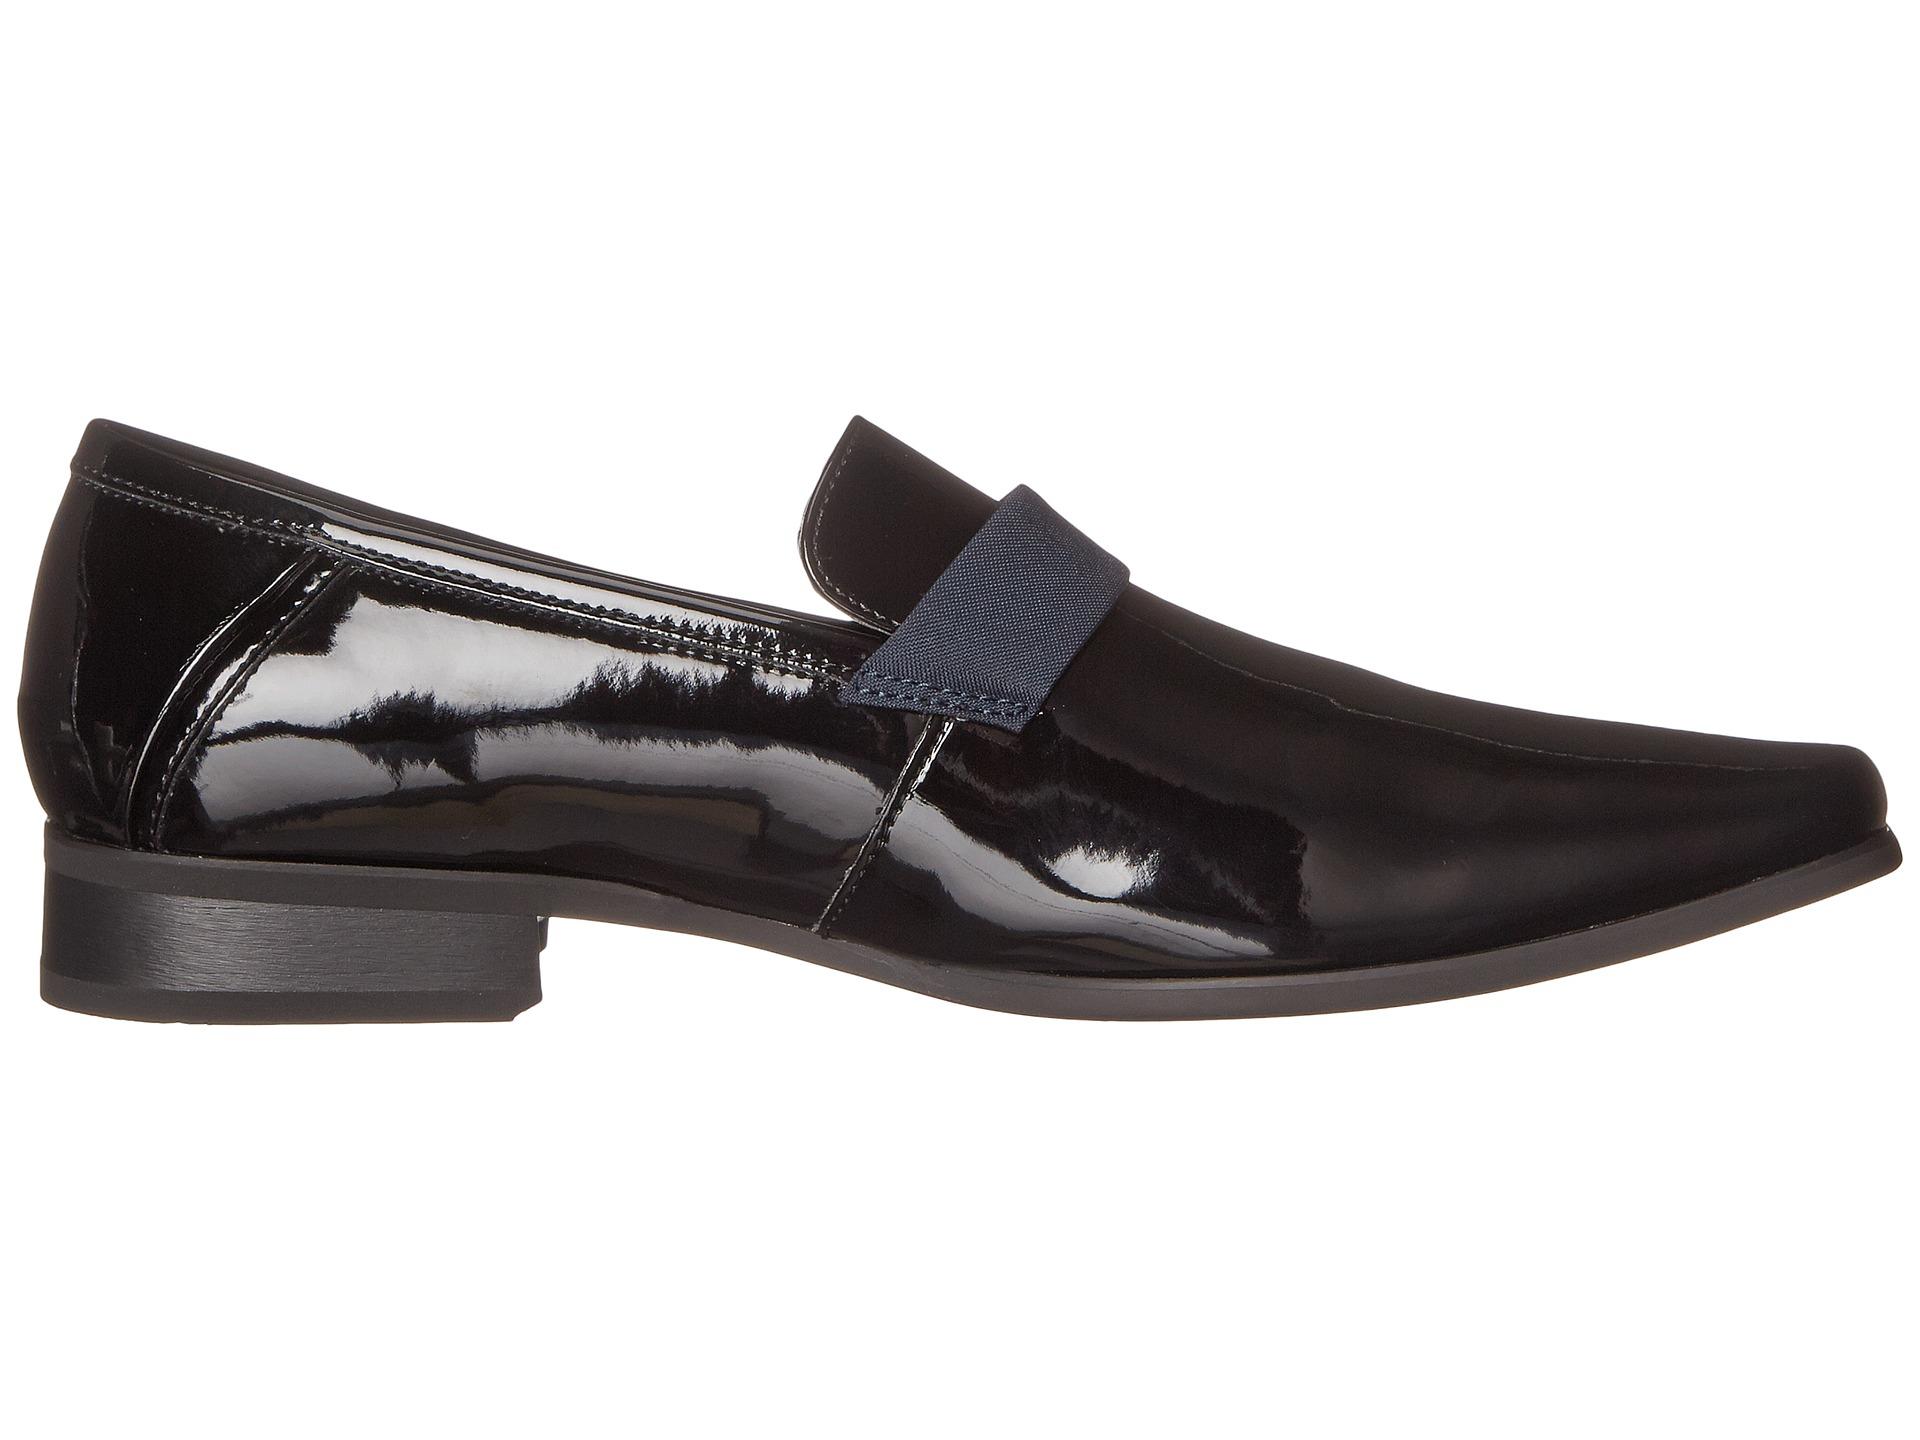 Calvin Klein Bernard Slip On Dress Shoes